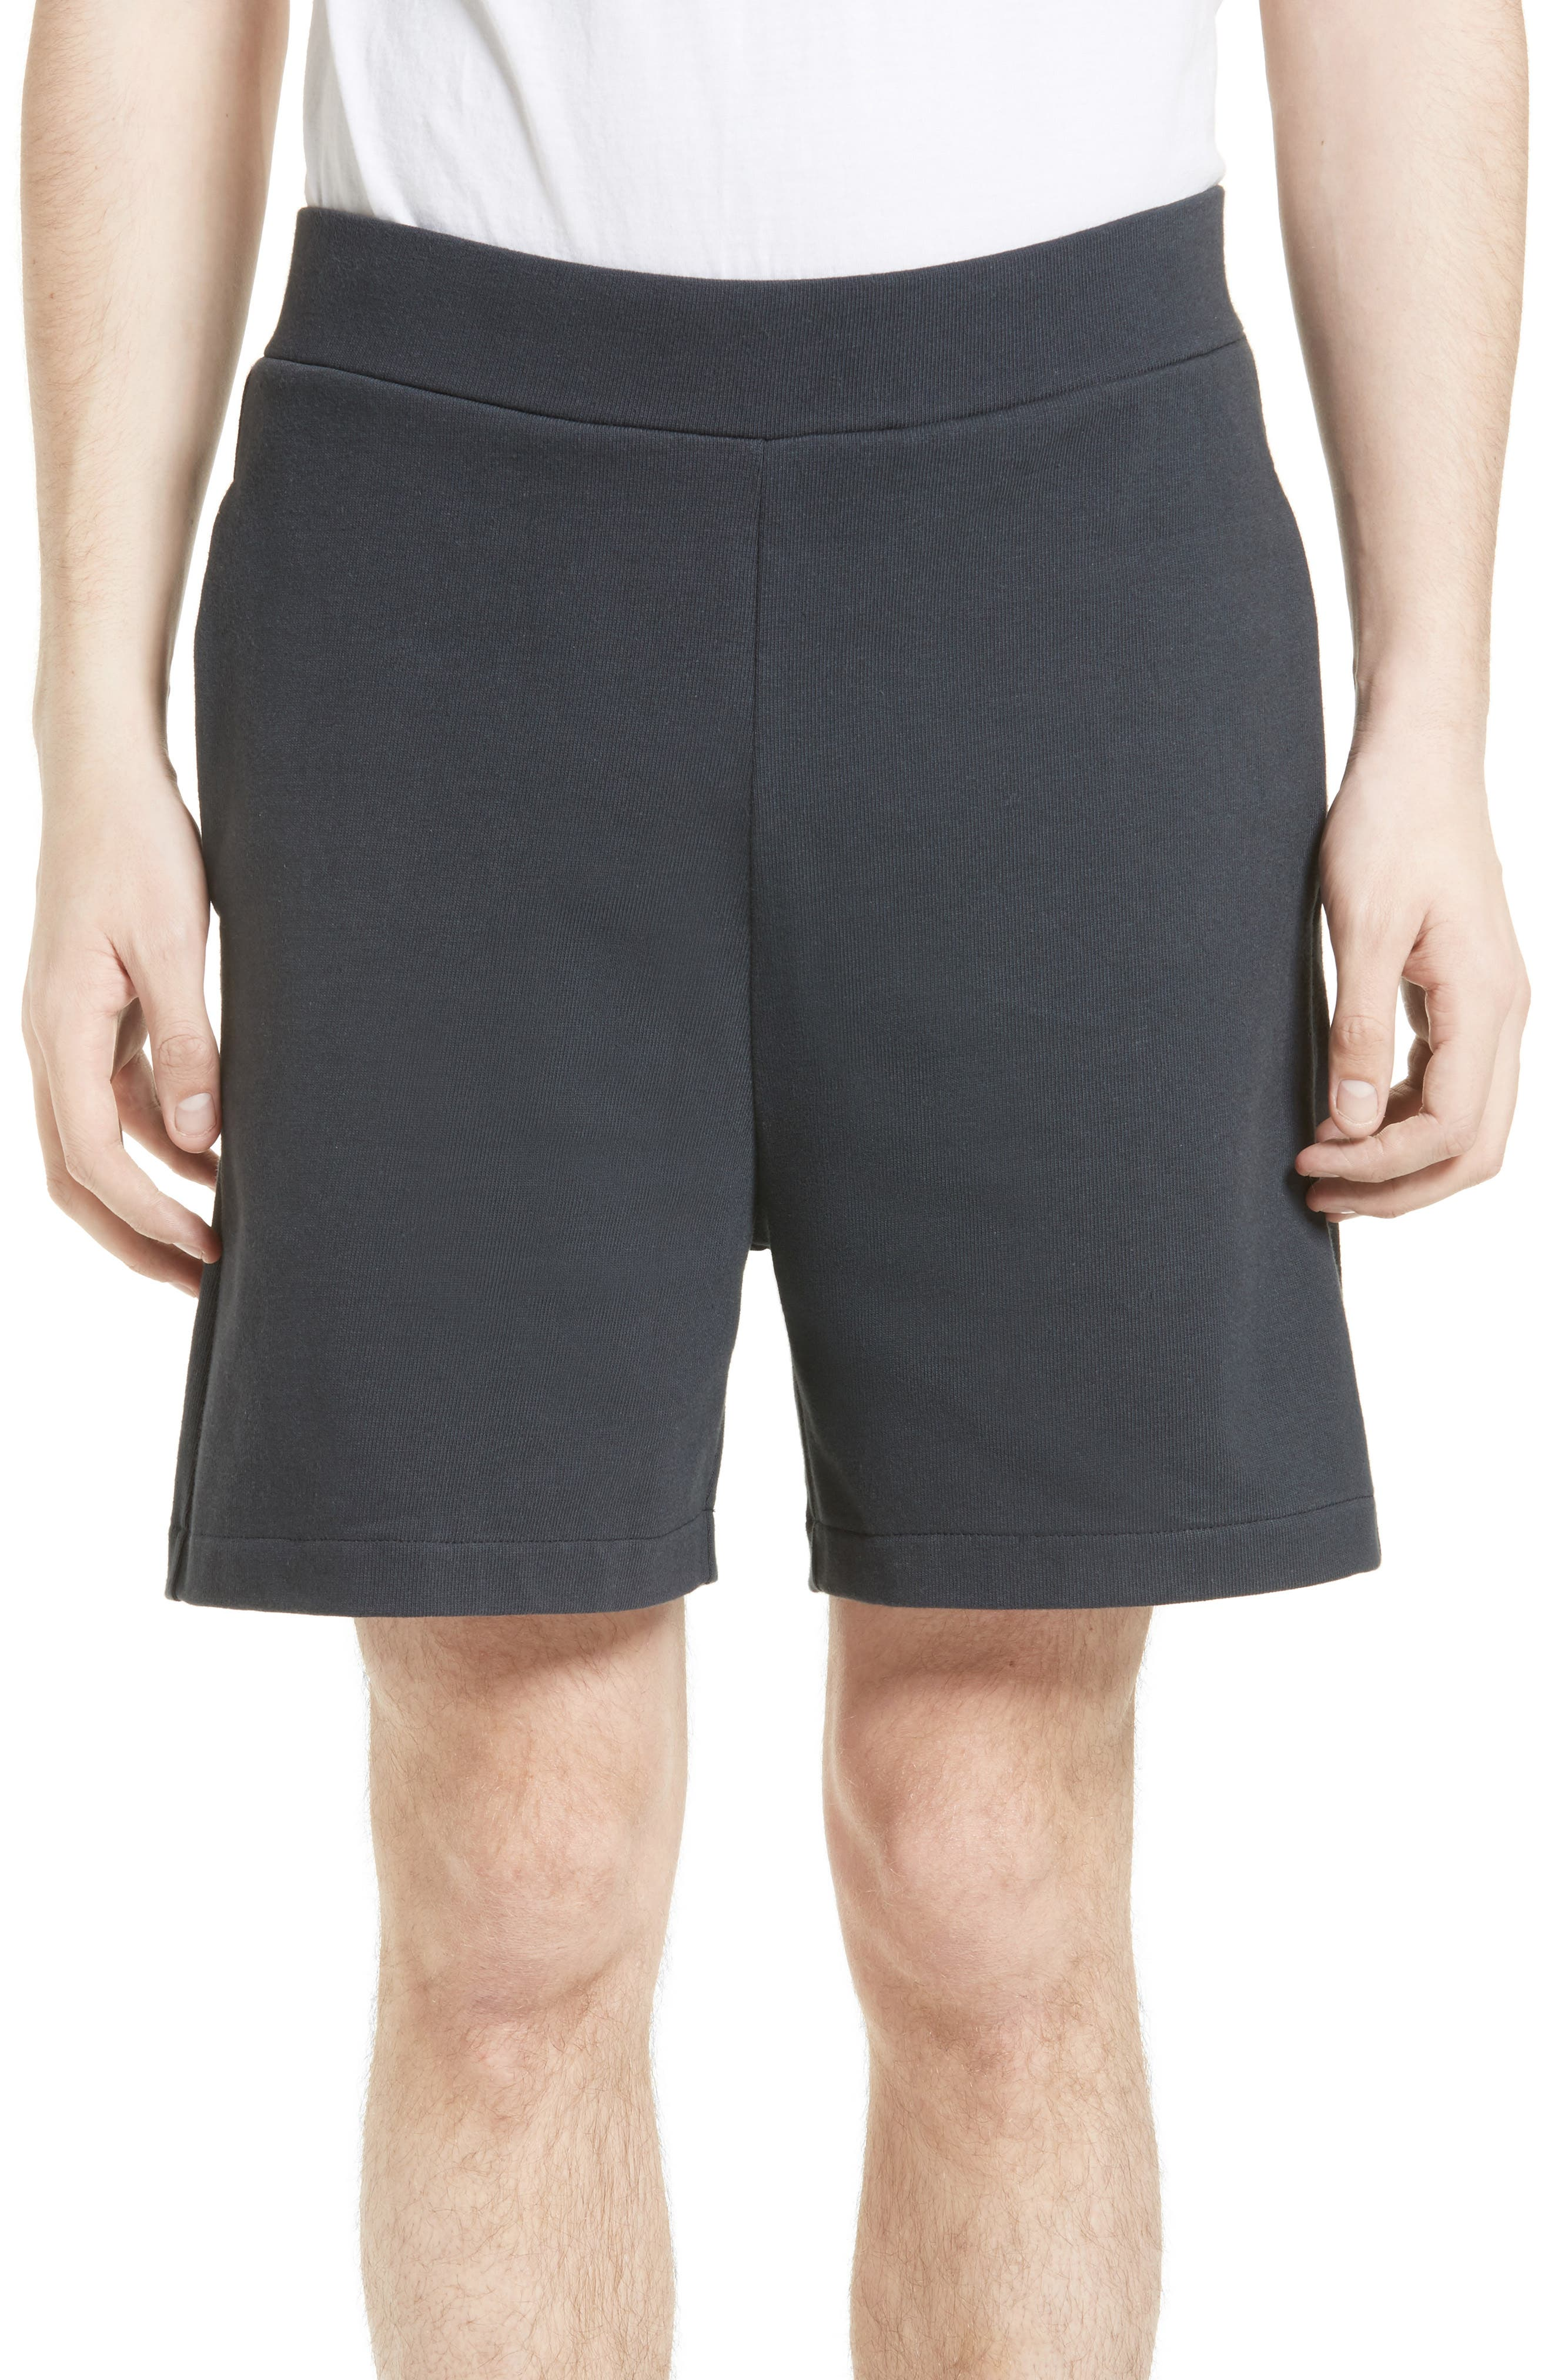 Green Park Jersey Shorts,                         Main,                         color, 020